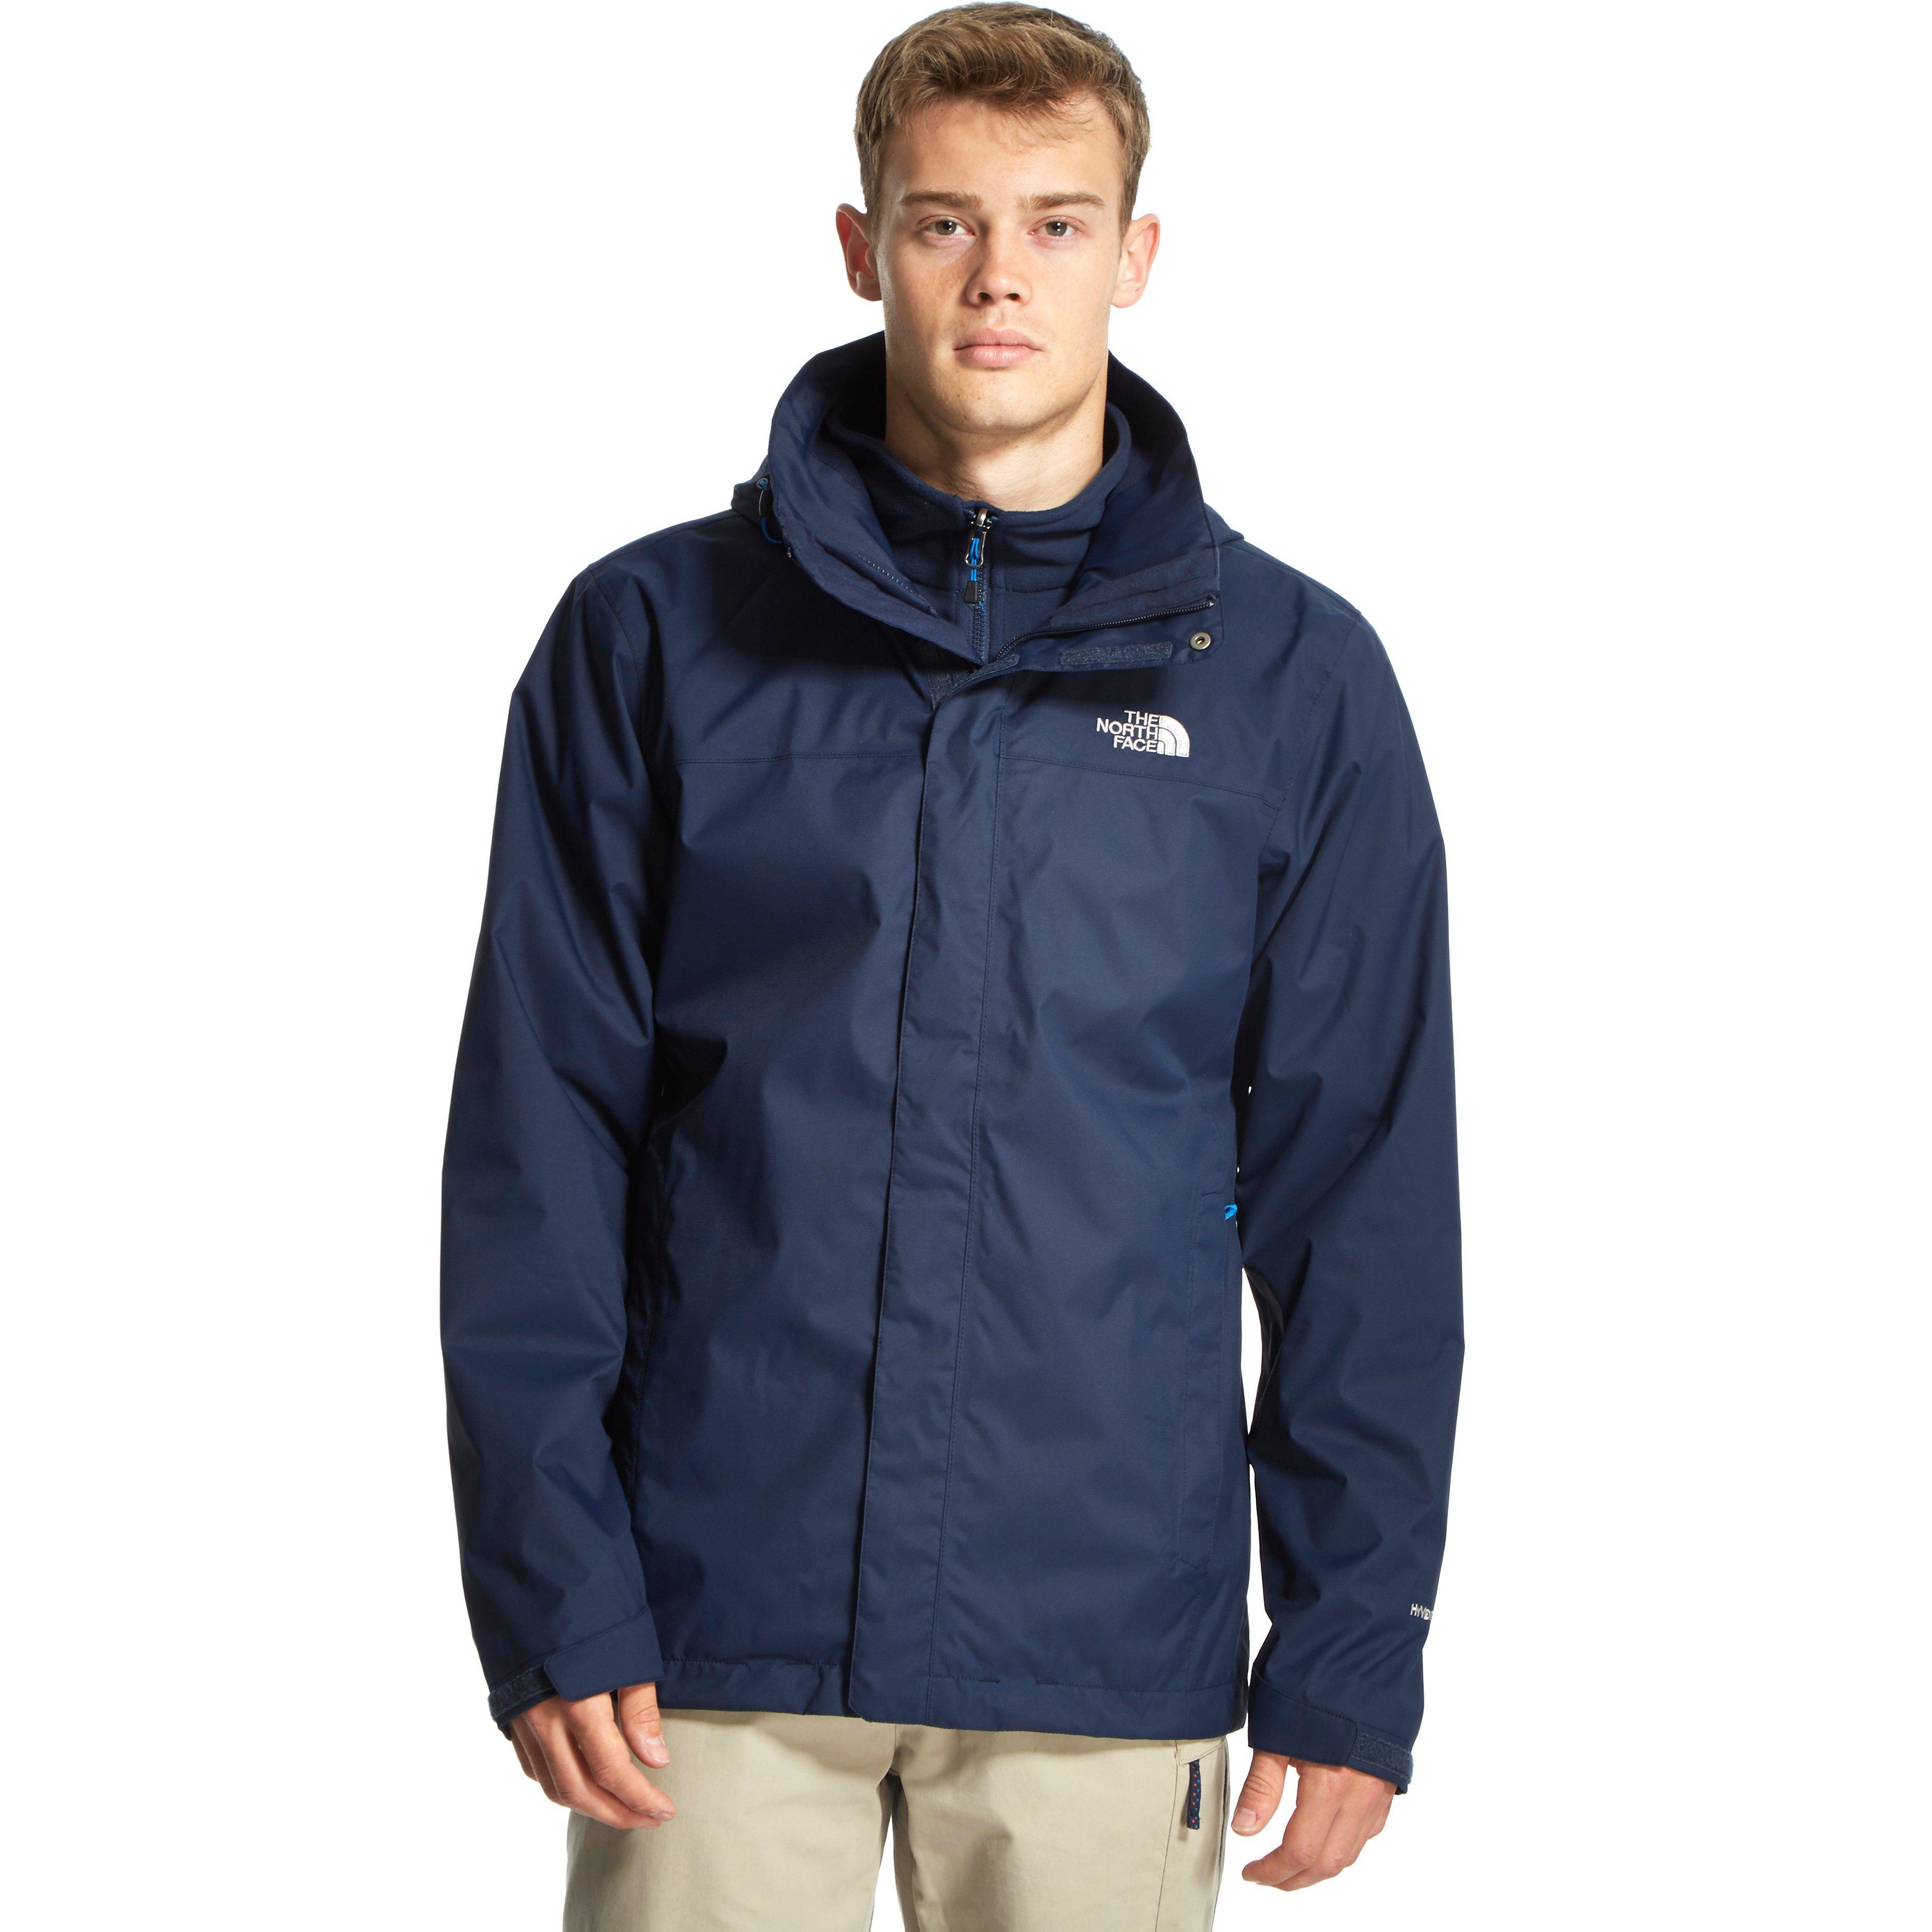 north face jakke tre i en the north face 3 in 1 jacket - Marwood  VeneerMarwood Veneer eb30b46d3